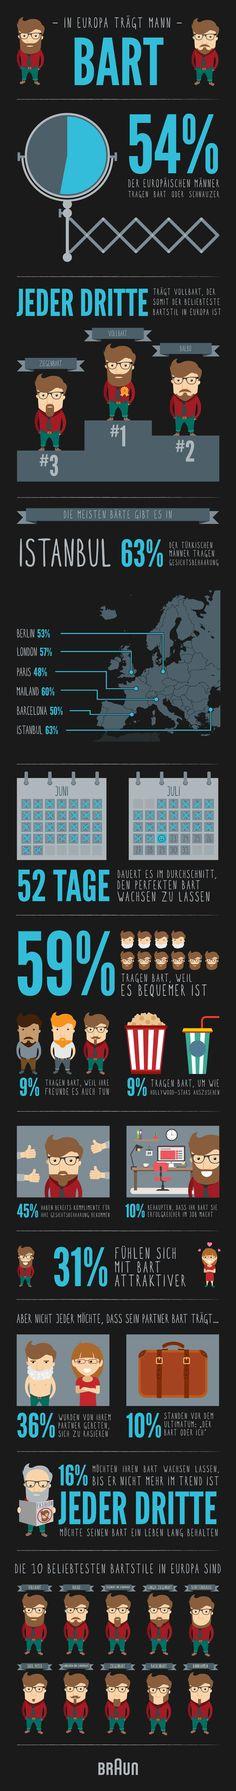 braun-infografik-bart